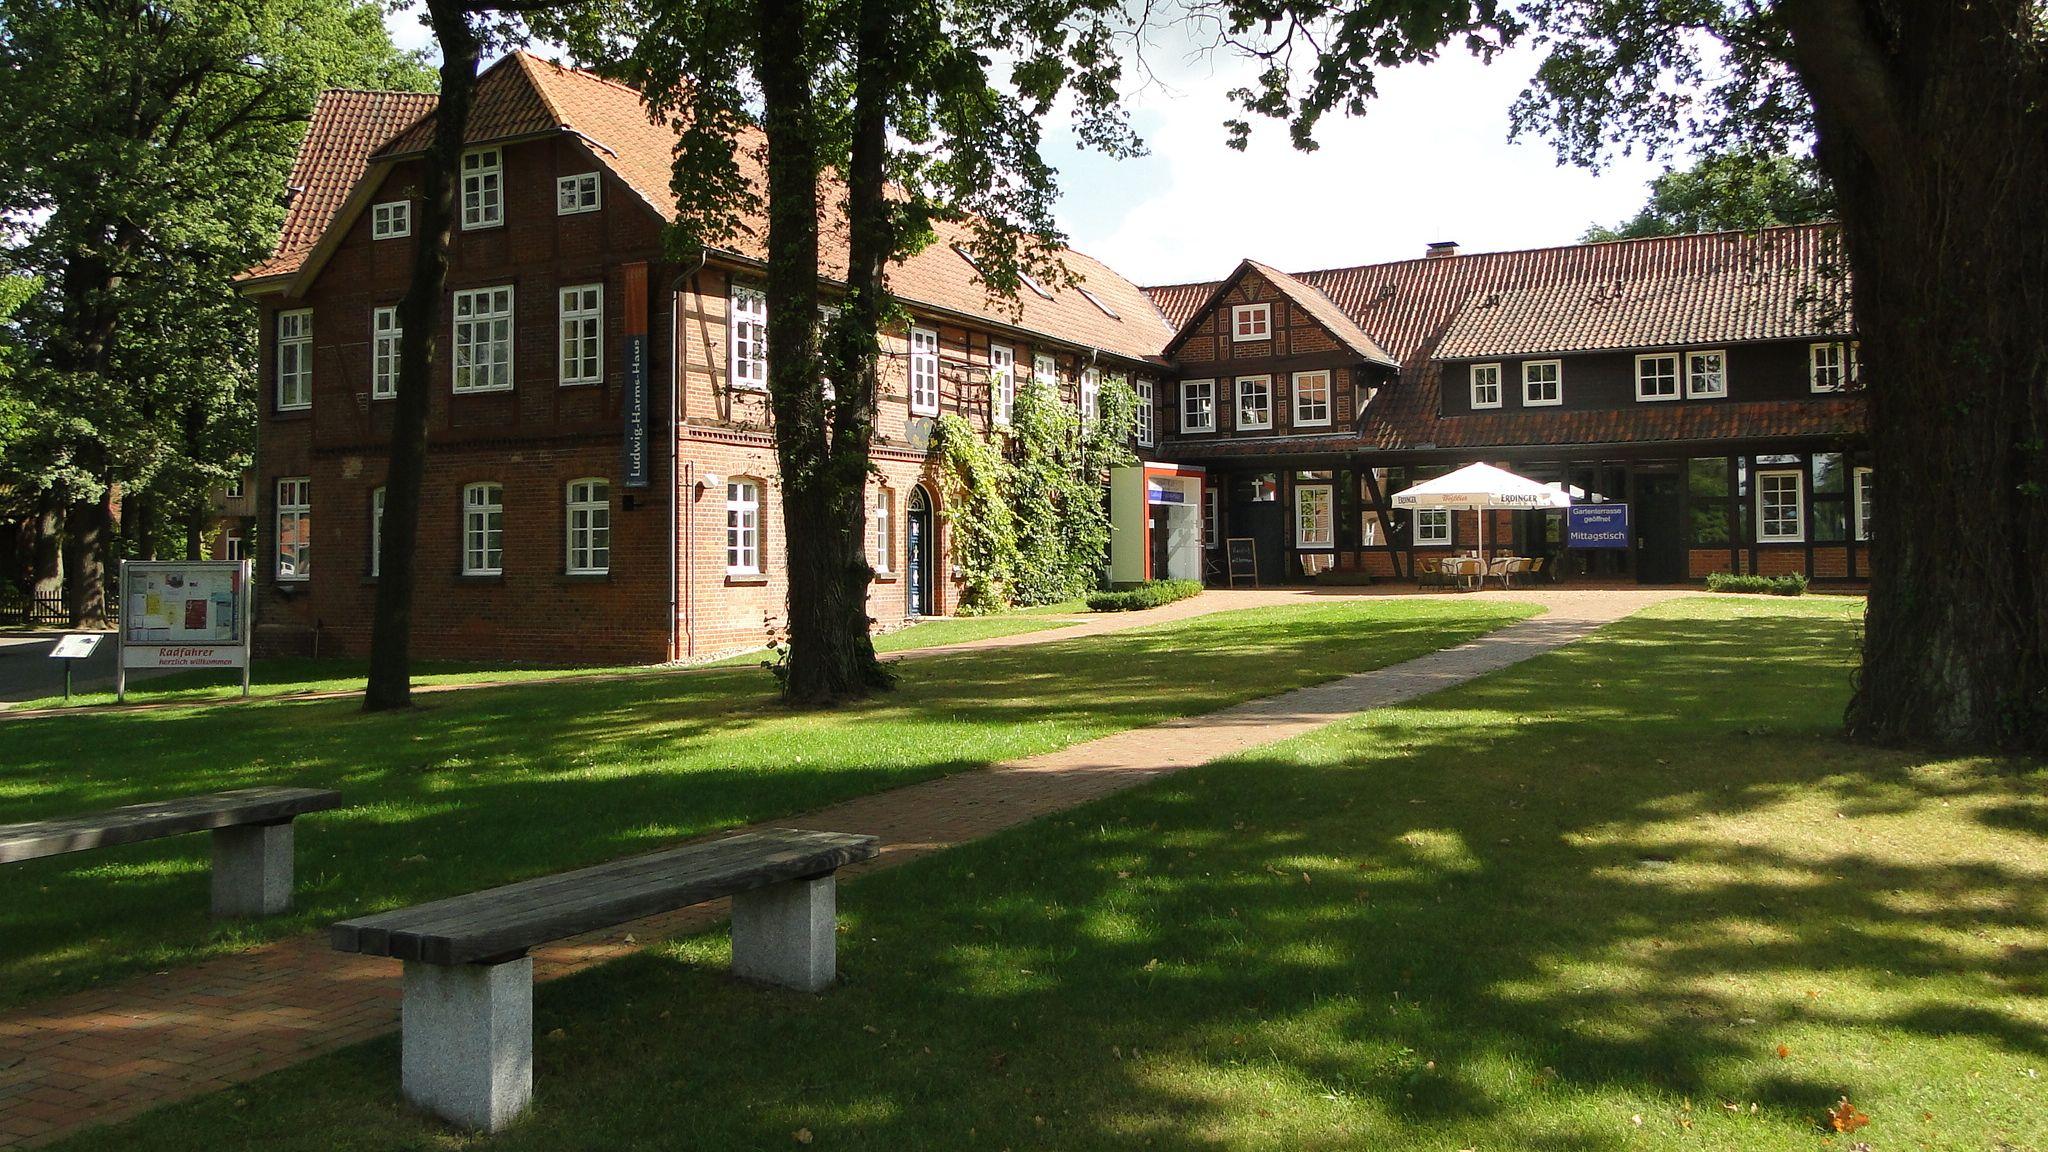 ludwig-harms-haus-hermannsburg-hp-a